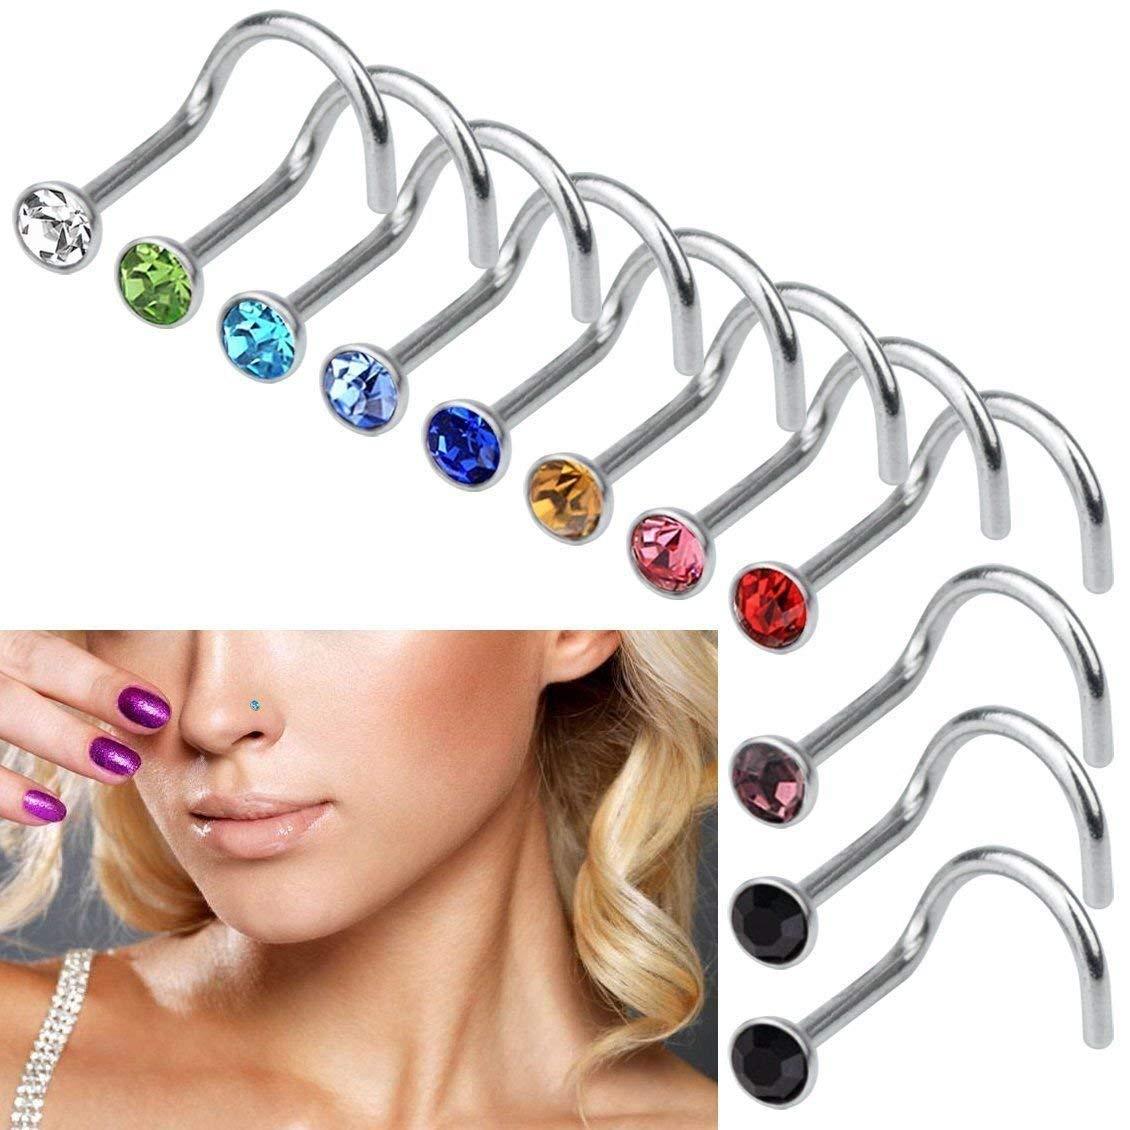 60x Steel Nose Studs Surgical Rhinestone Body Jewellery Earring Piercing Dangler